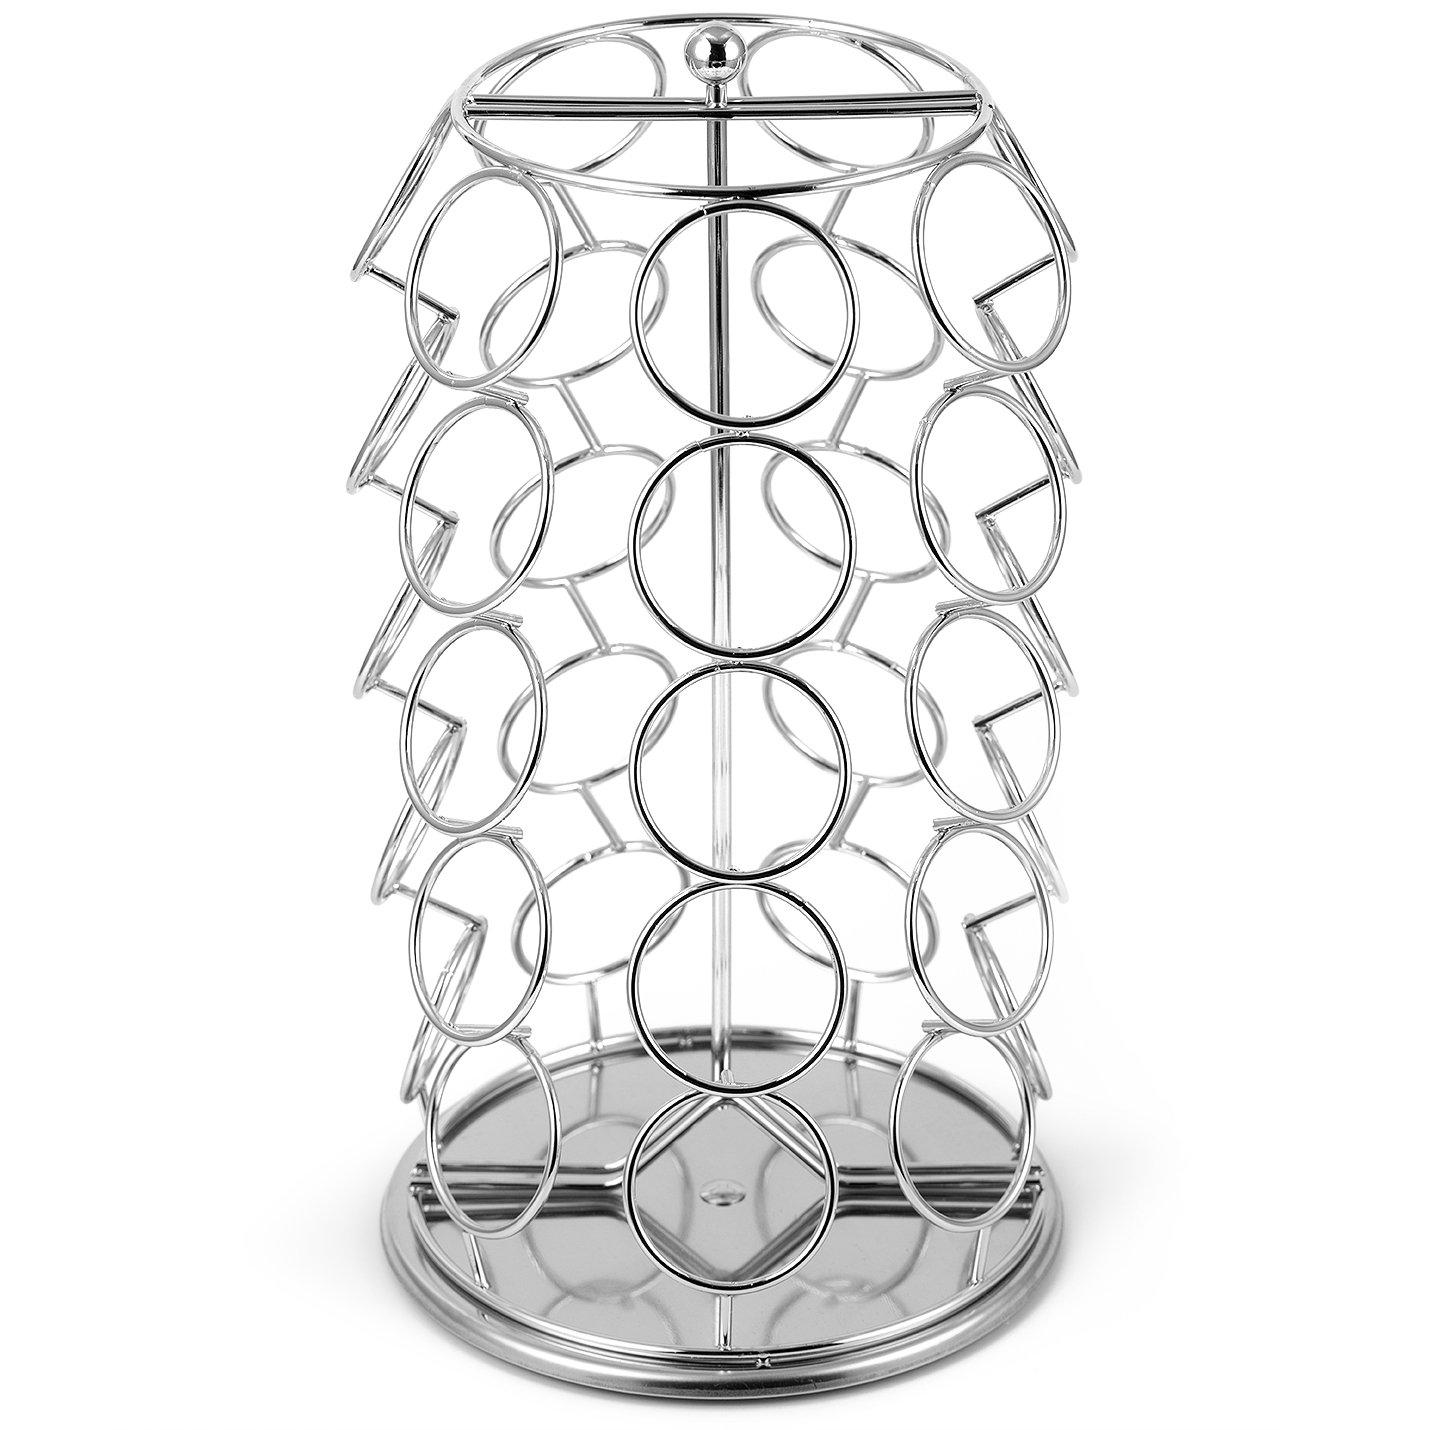 K Cup Holderoak Leaf Coffee Storage Spinning Carousel Organizer For Keurig K-.. 10